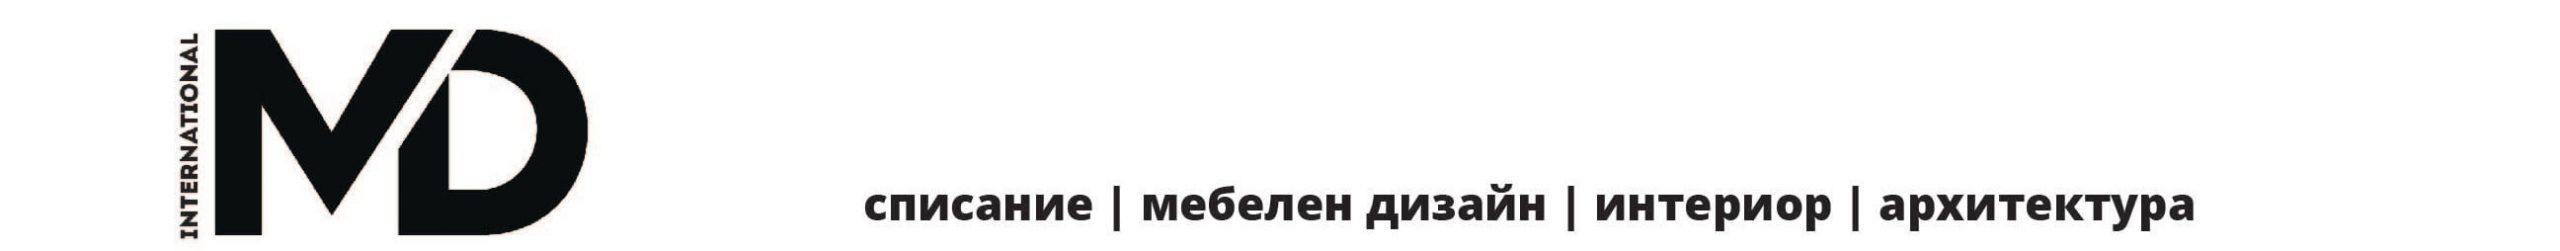 СПИСАНИЕ МД